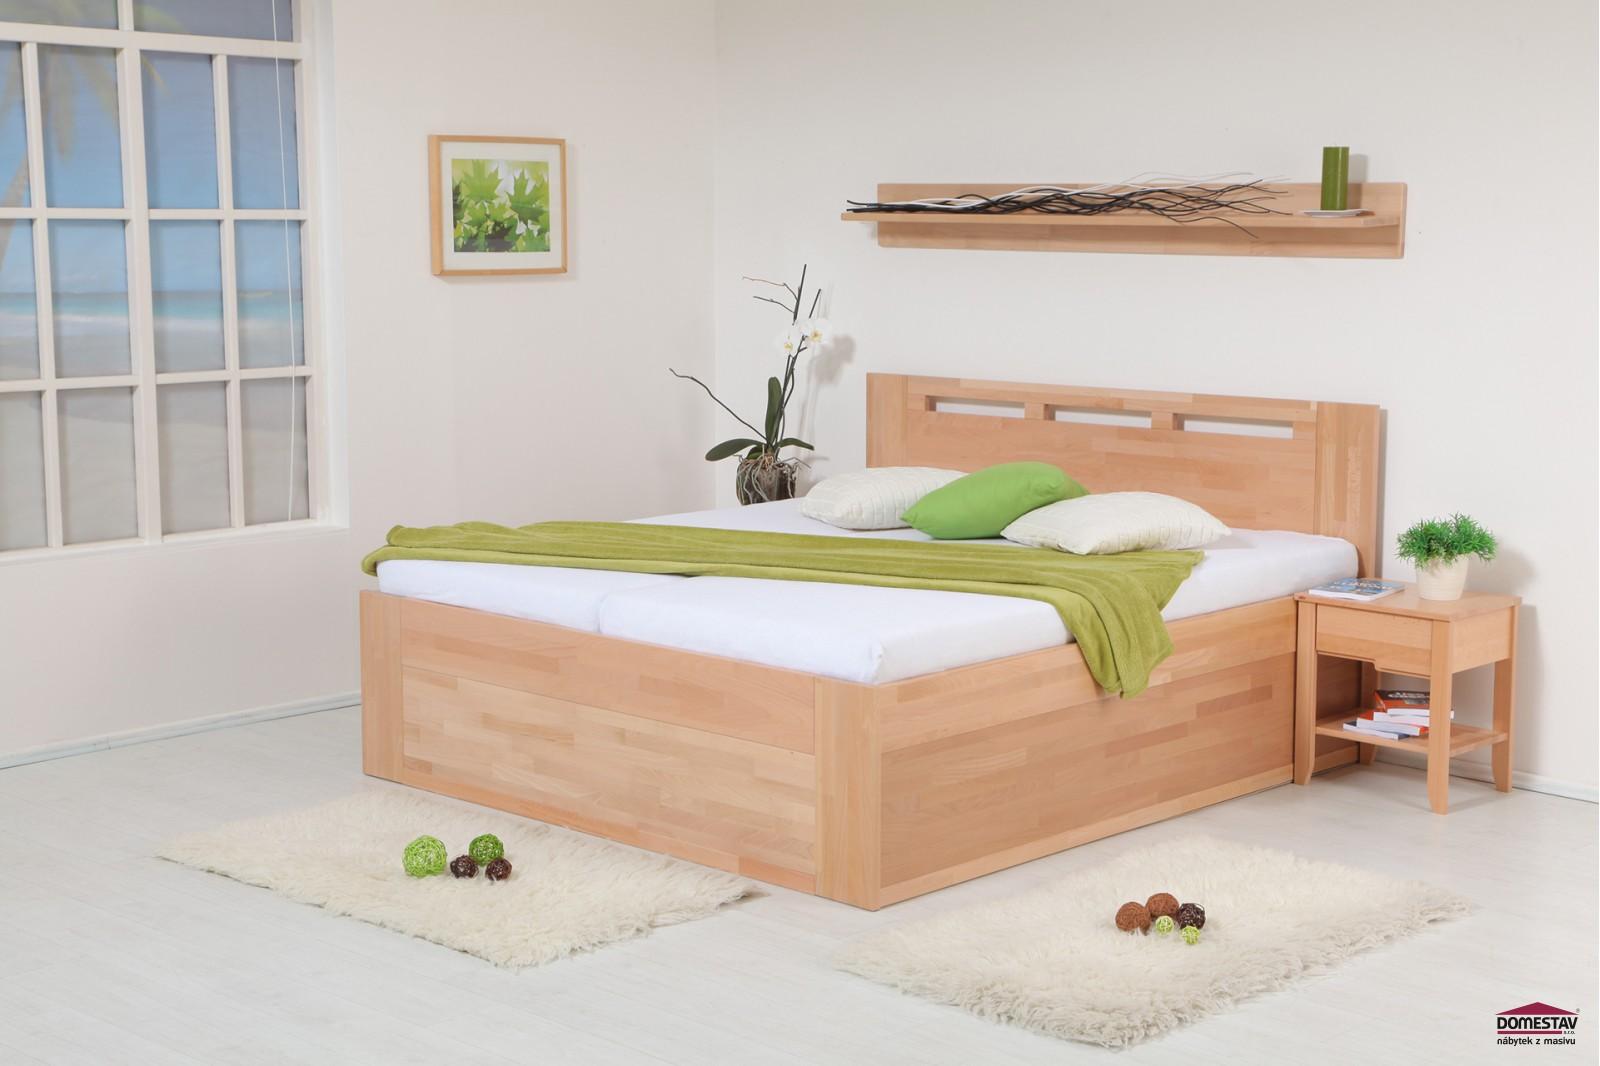 62f2aef67163 Manželská postel VALENCIA Senior s úložným prostorem 180 cm buk cink ...